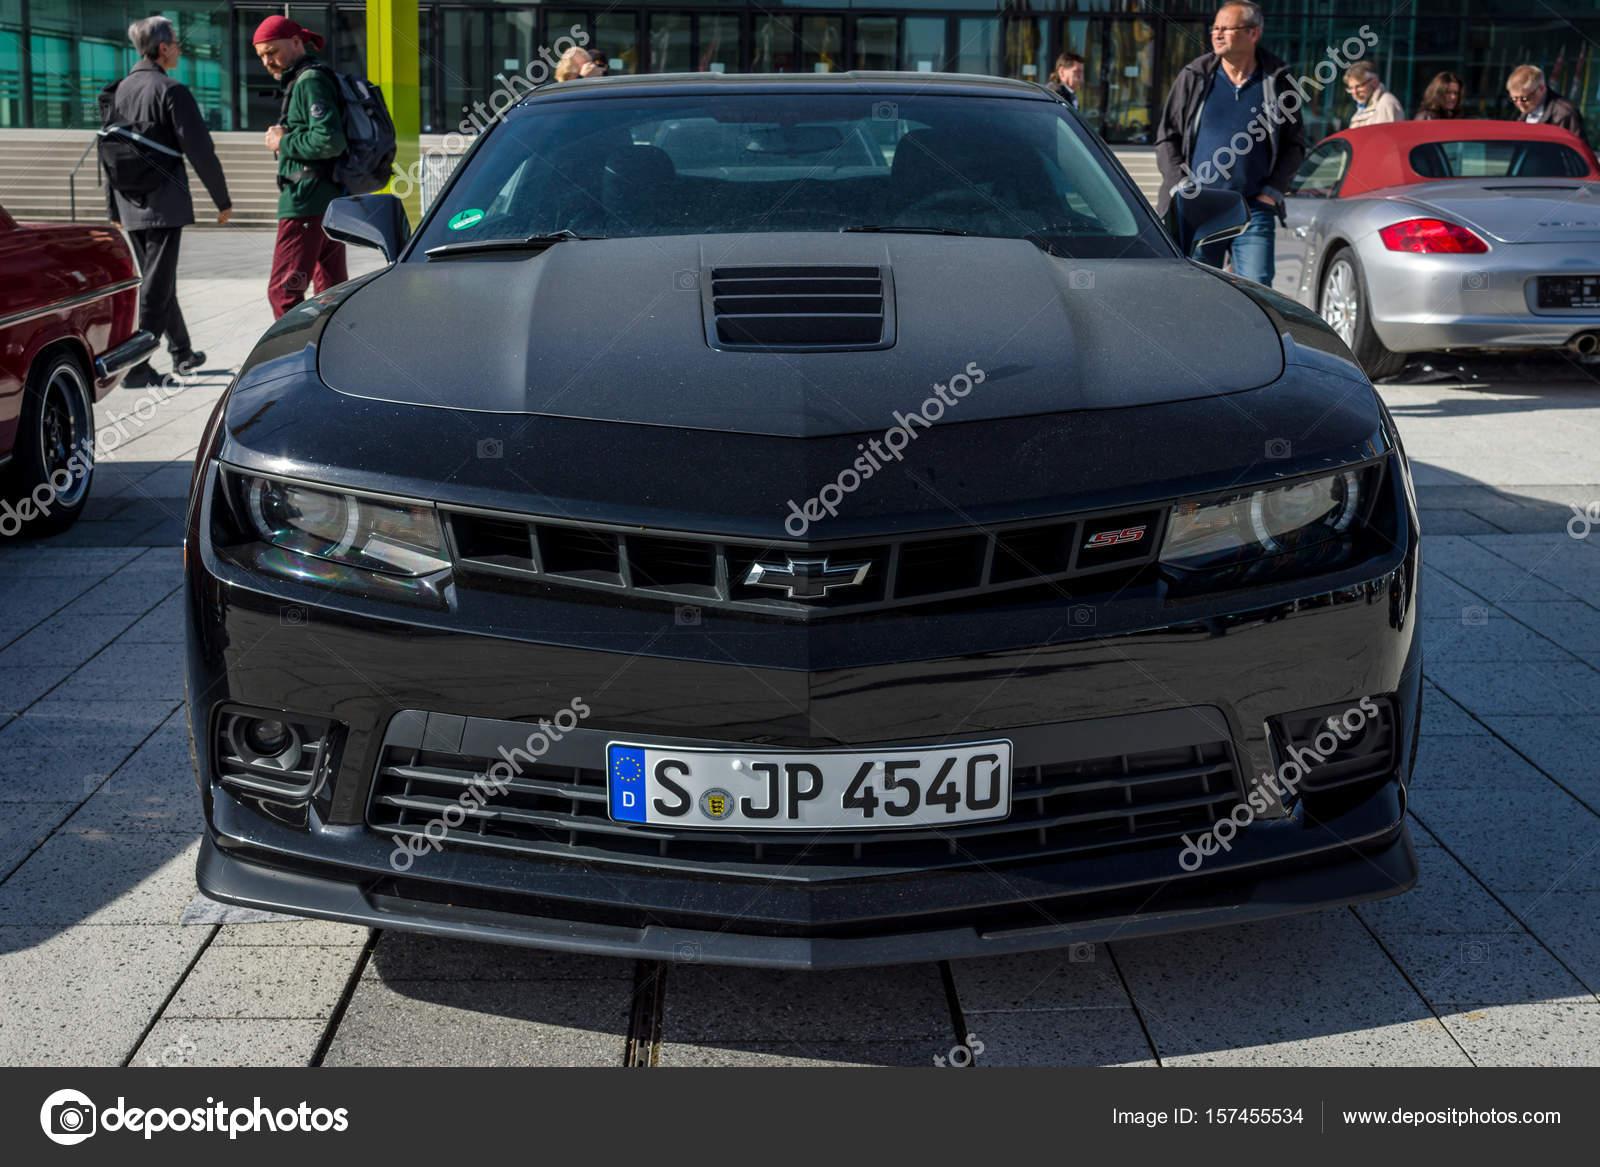 muscle-car der chevrolet camaro ss (5. generation), 2015